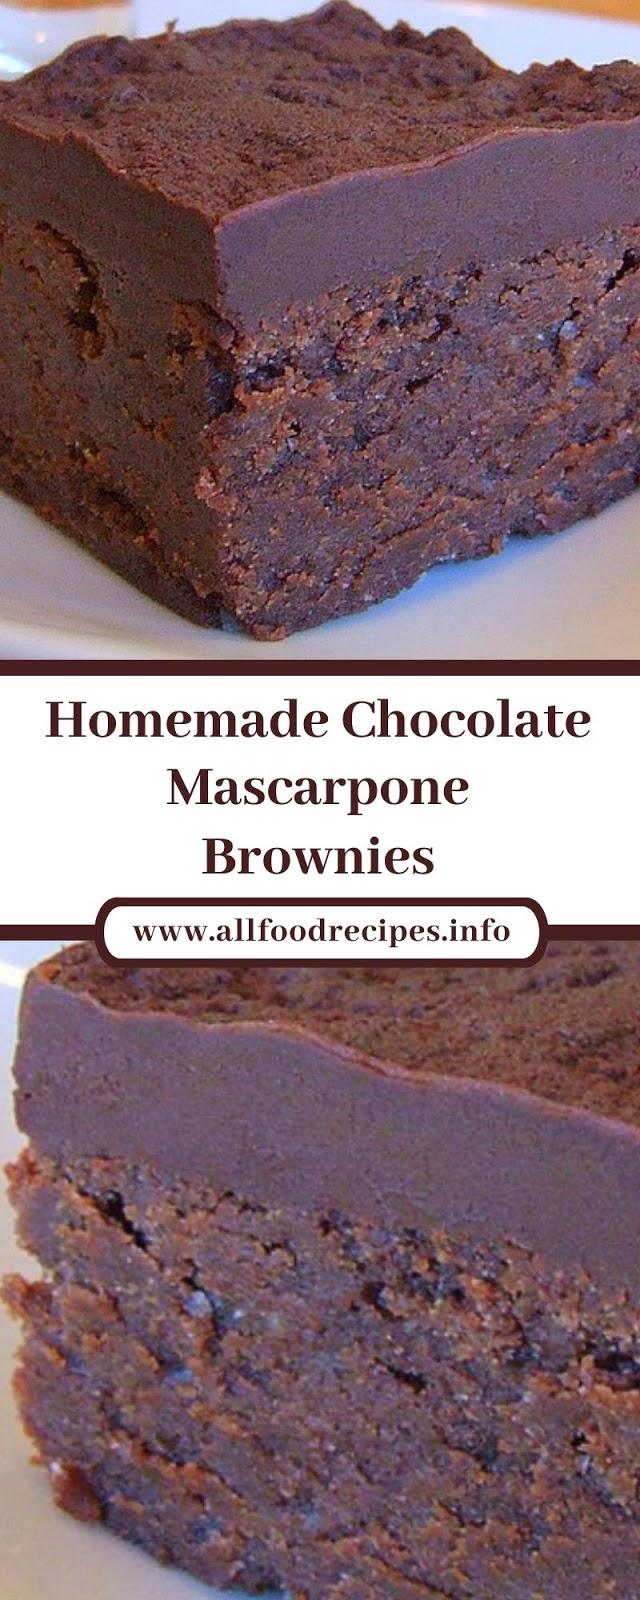 Homemade Chocolate Mascarpone Brownies